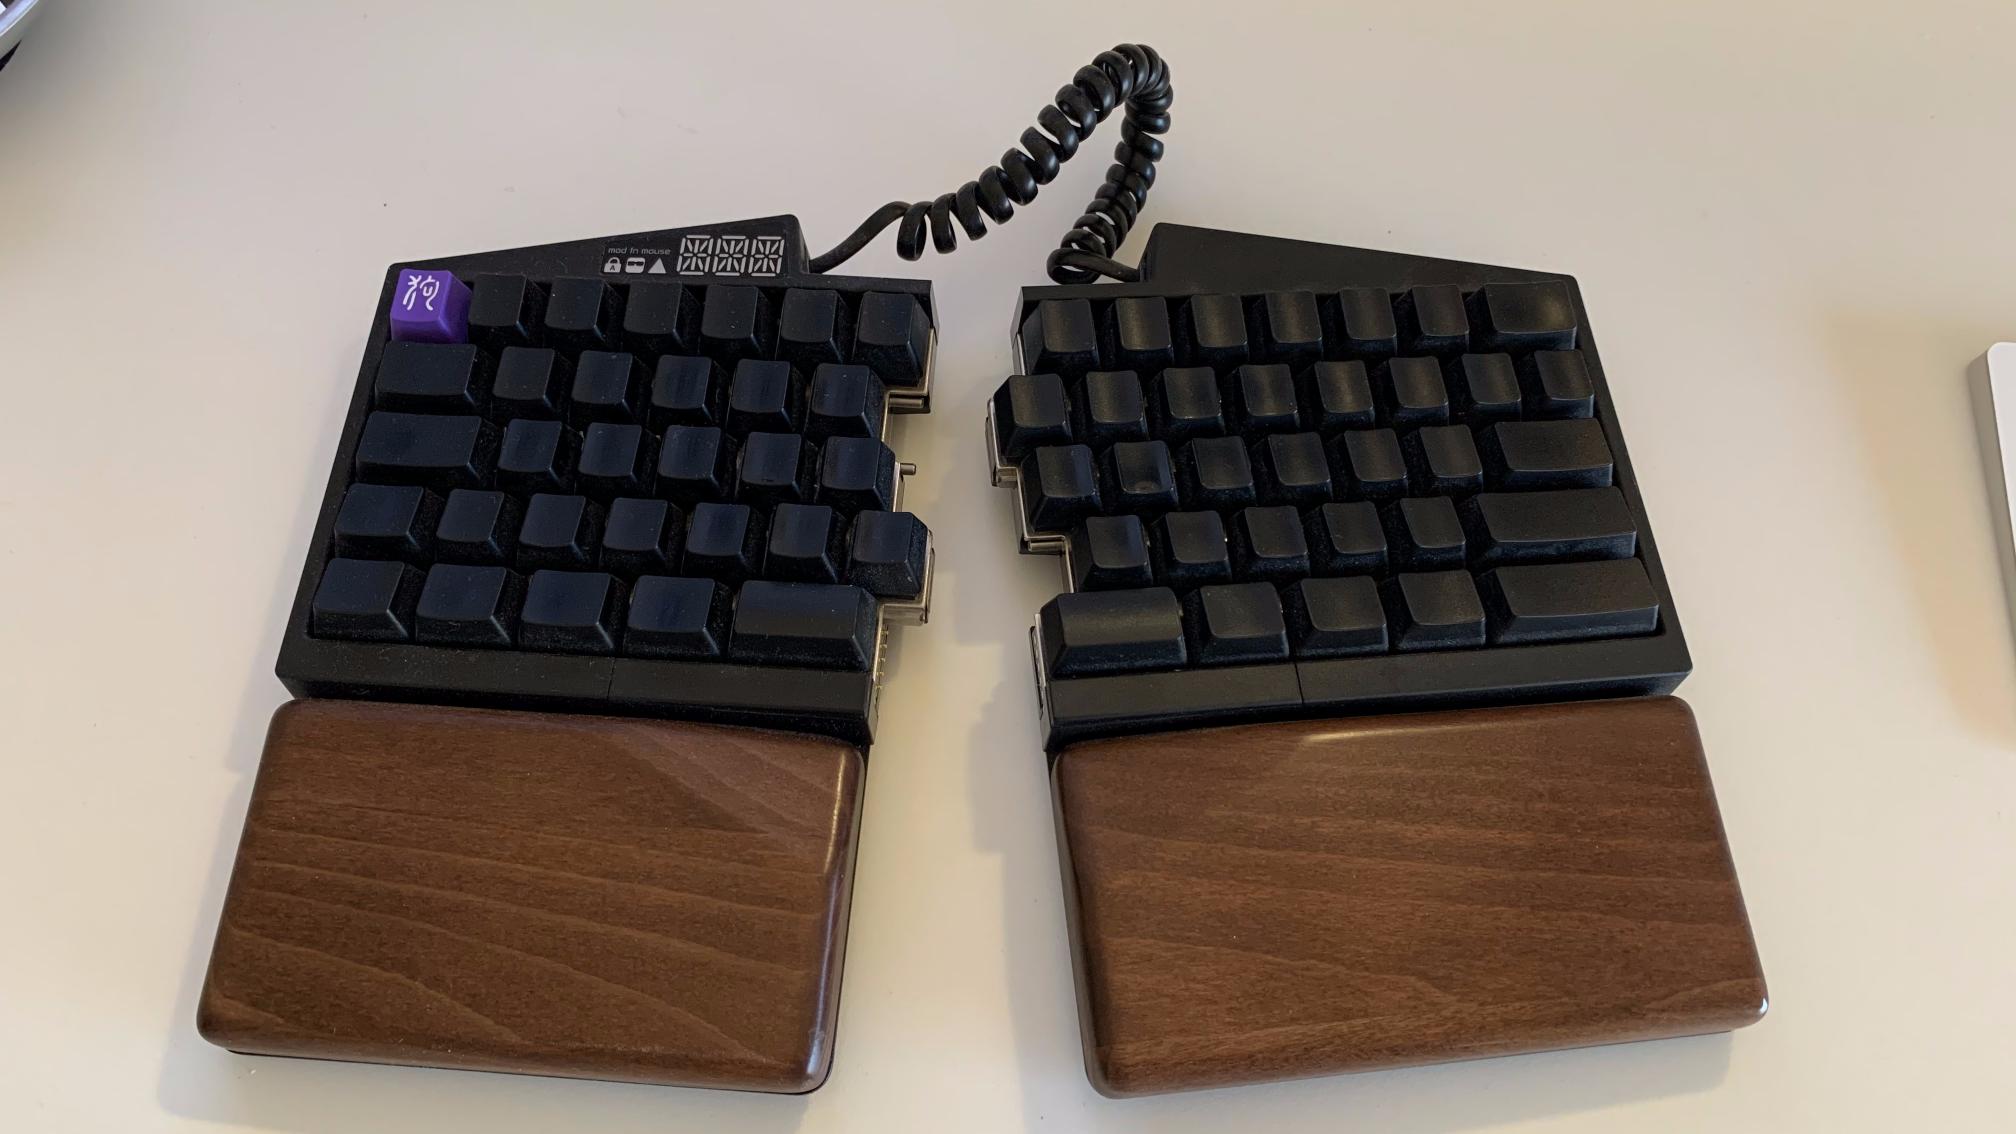 Hero image of the keyboard